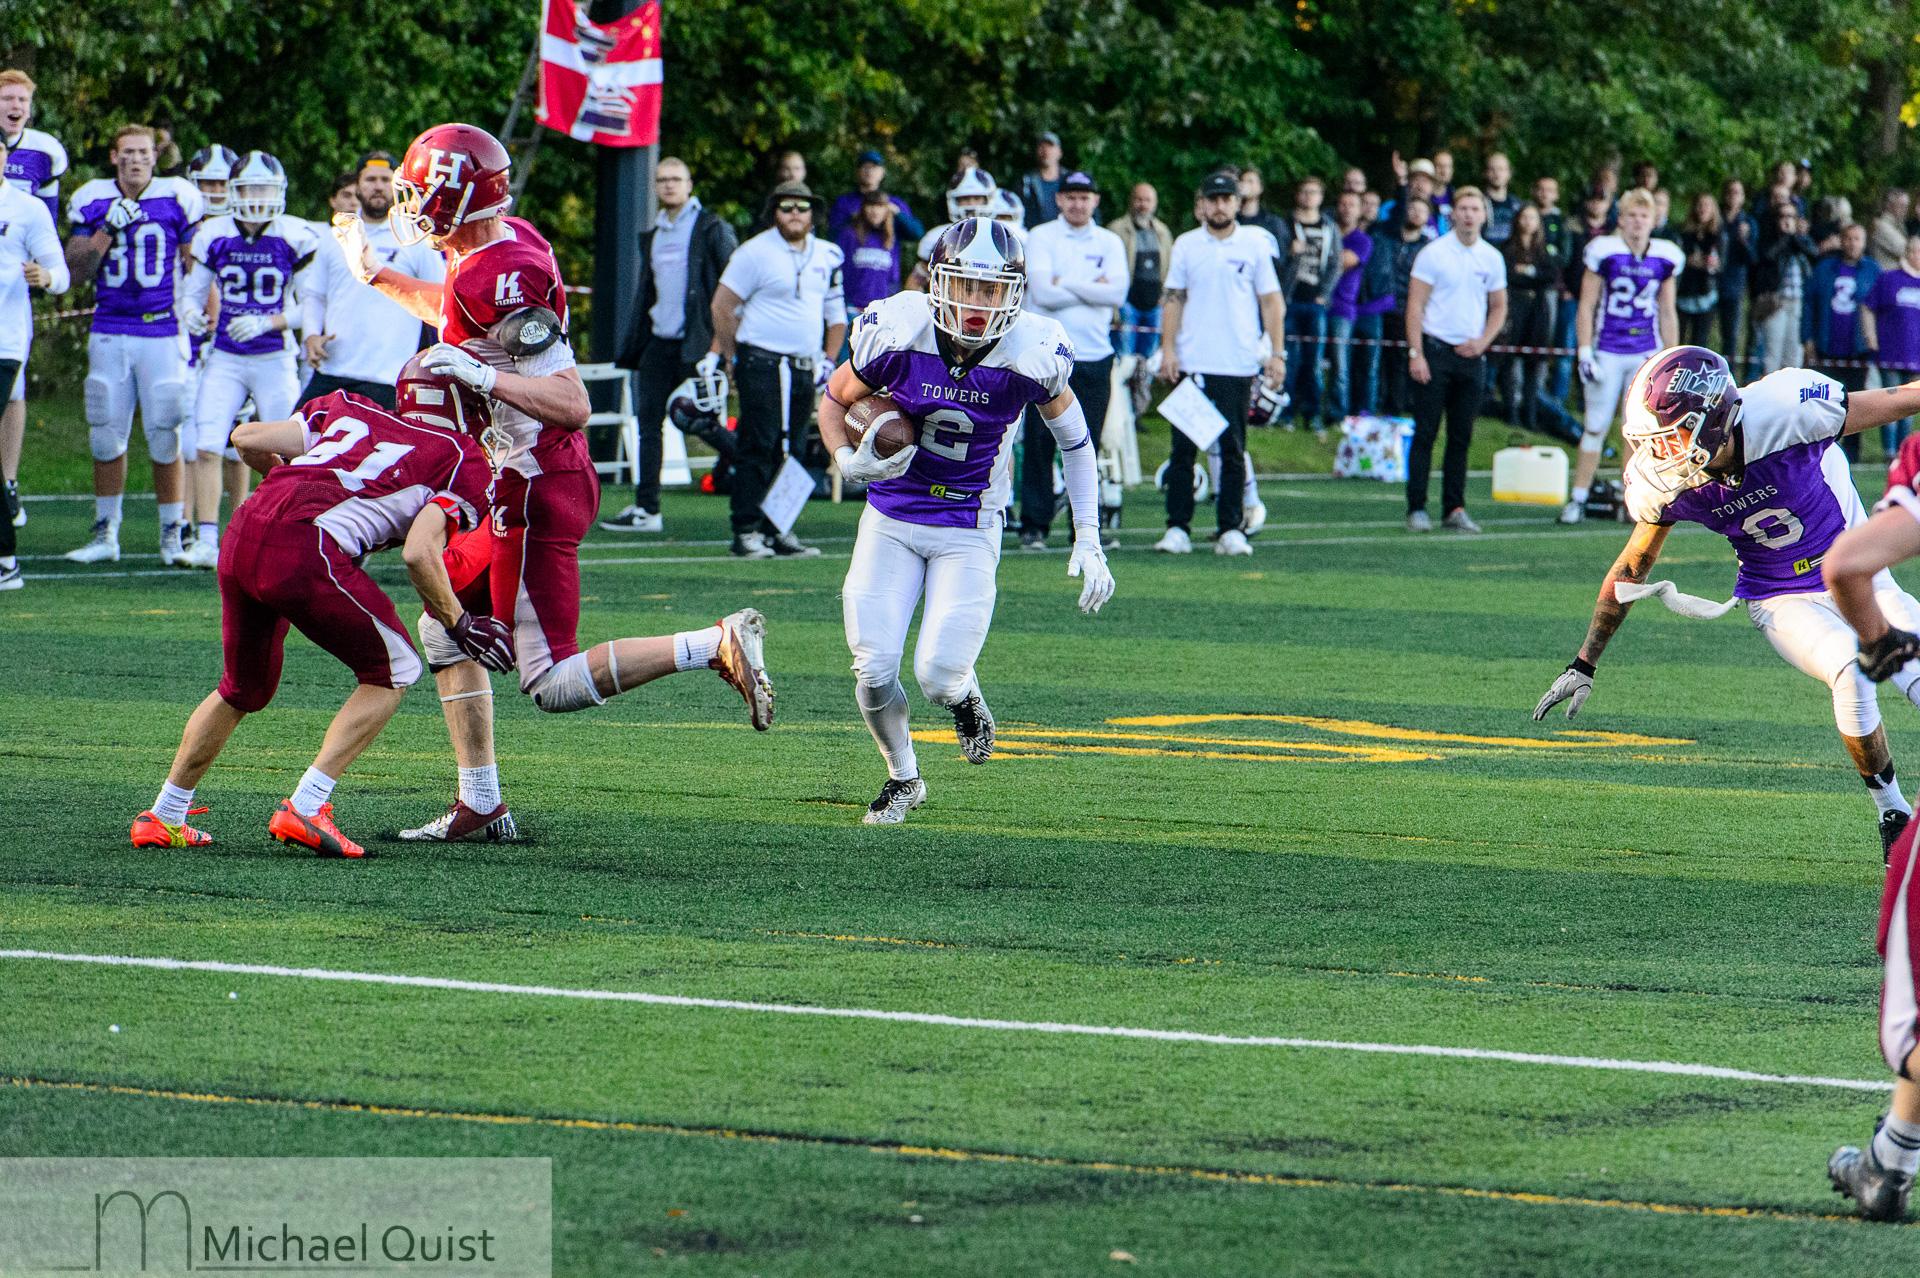 Junior-Bowl-2015-Copenhagen-Towers-vs-Herlev-Rebels-73